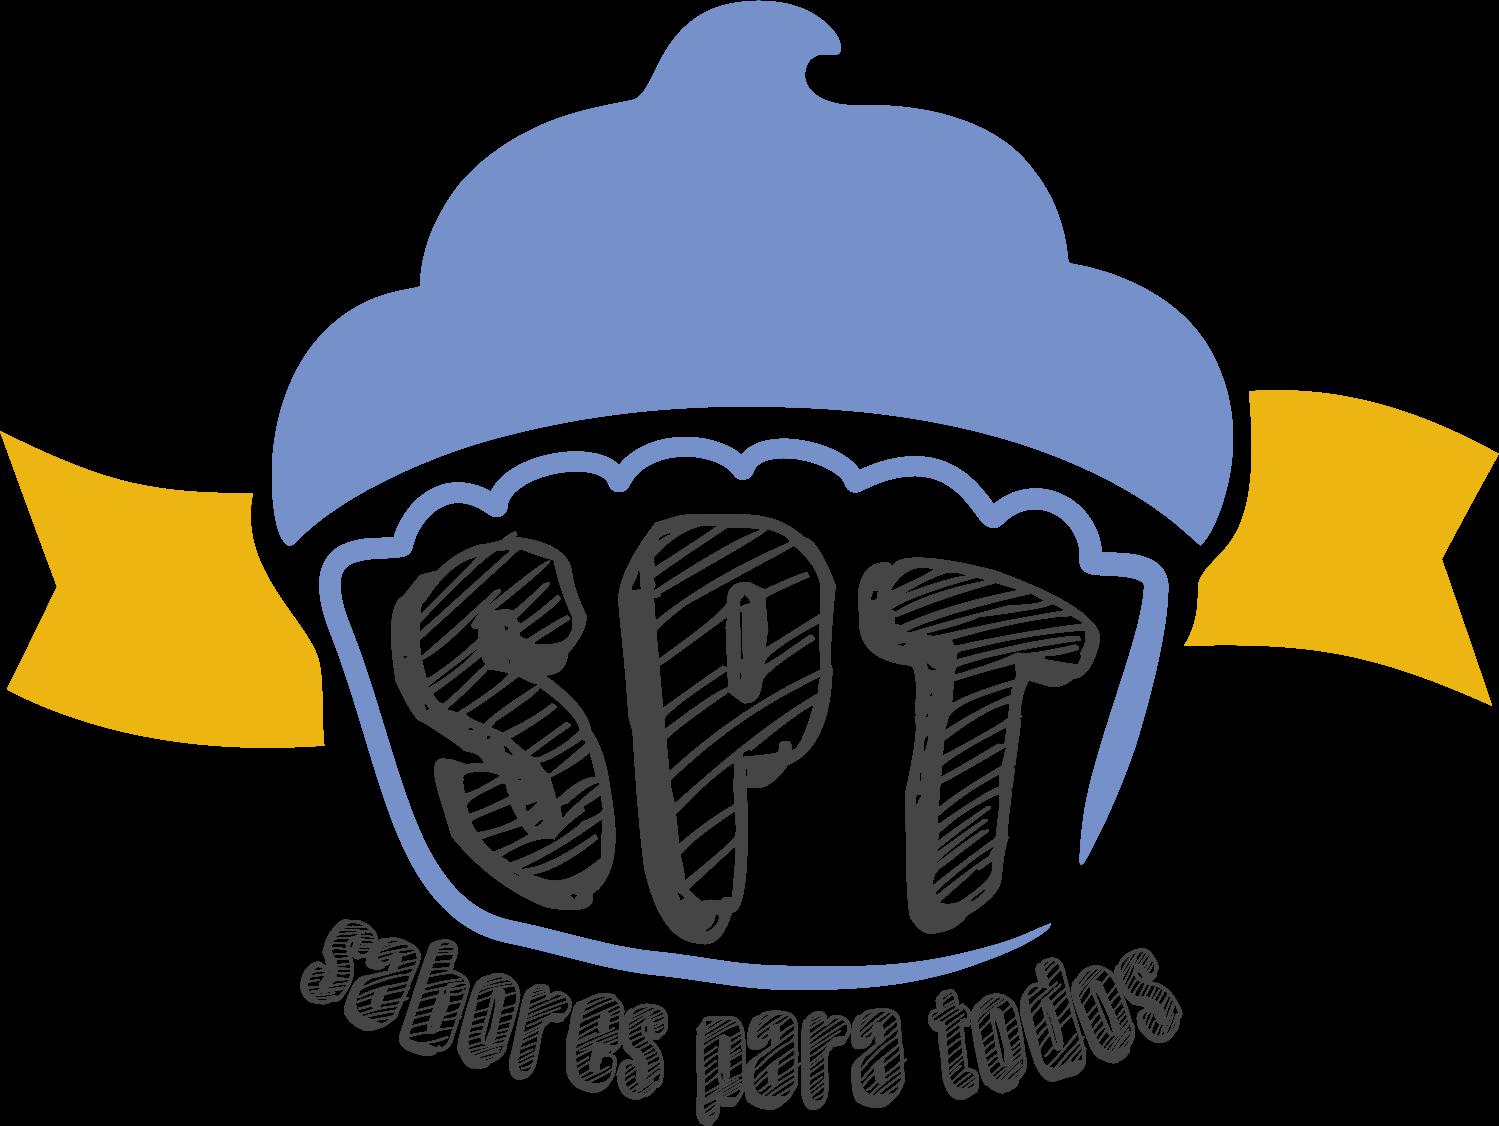 logo reposteria creativa